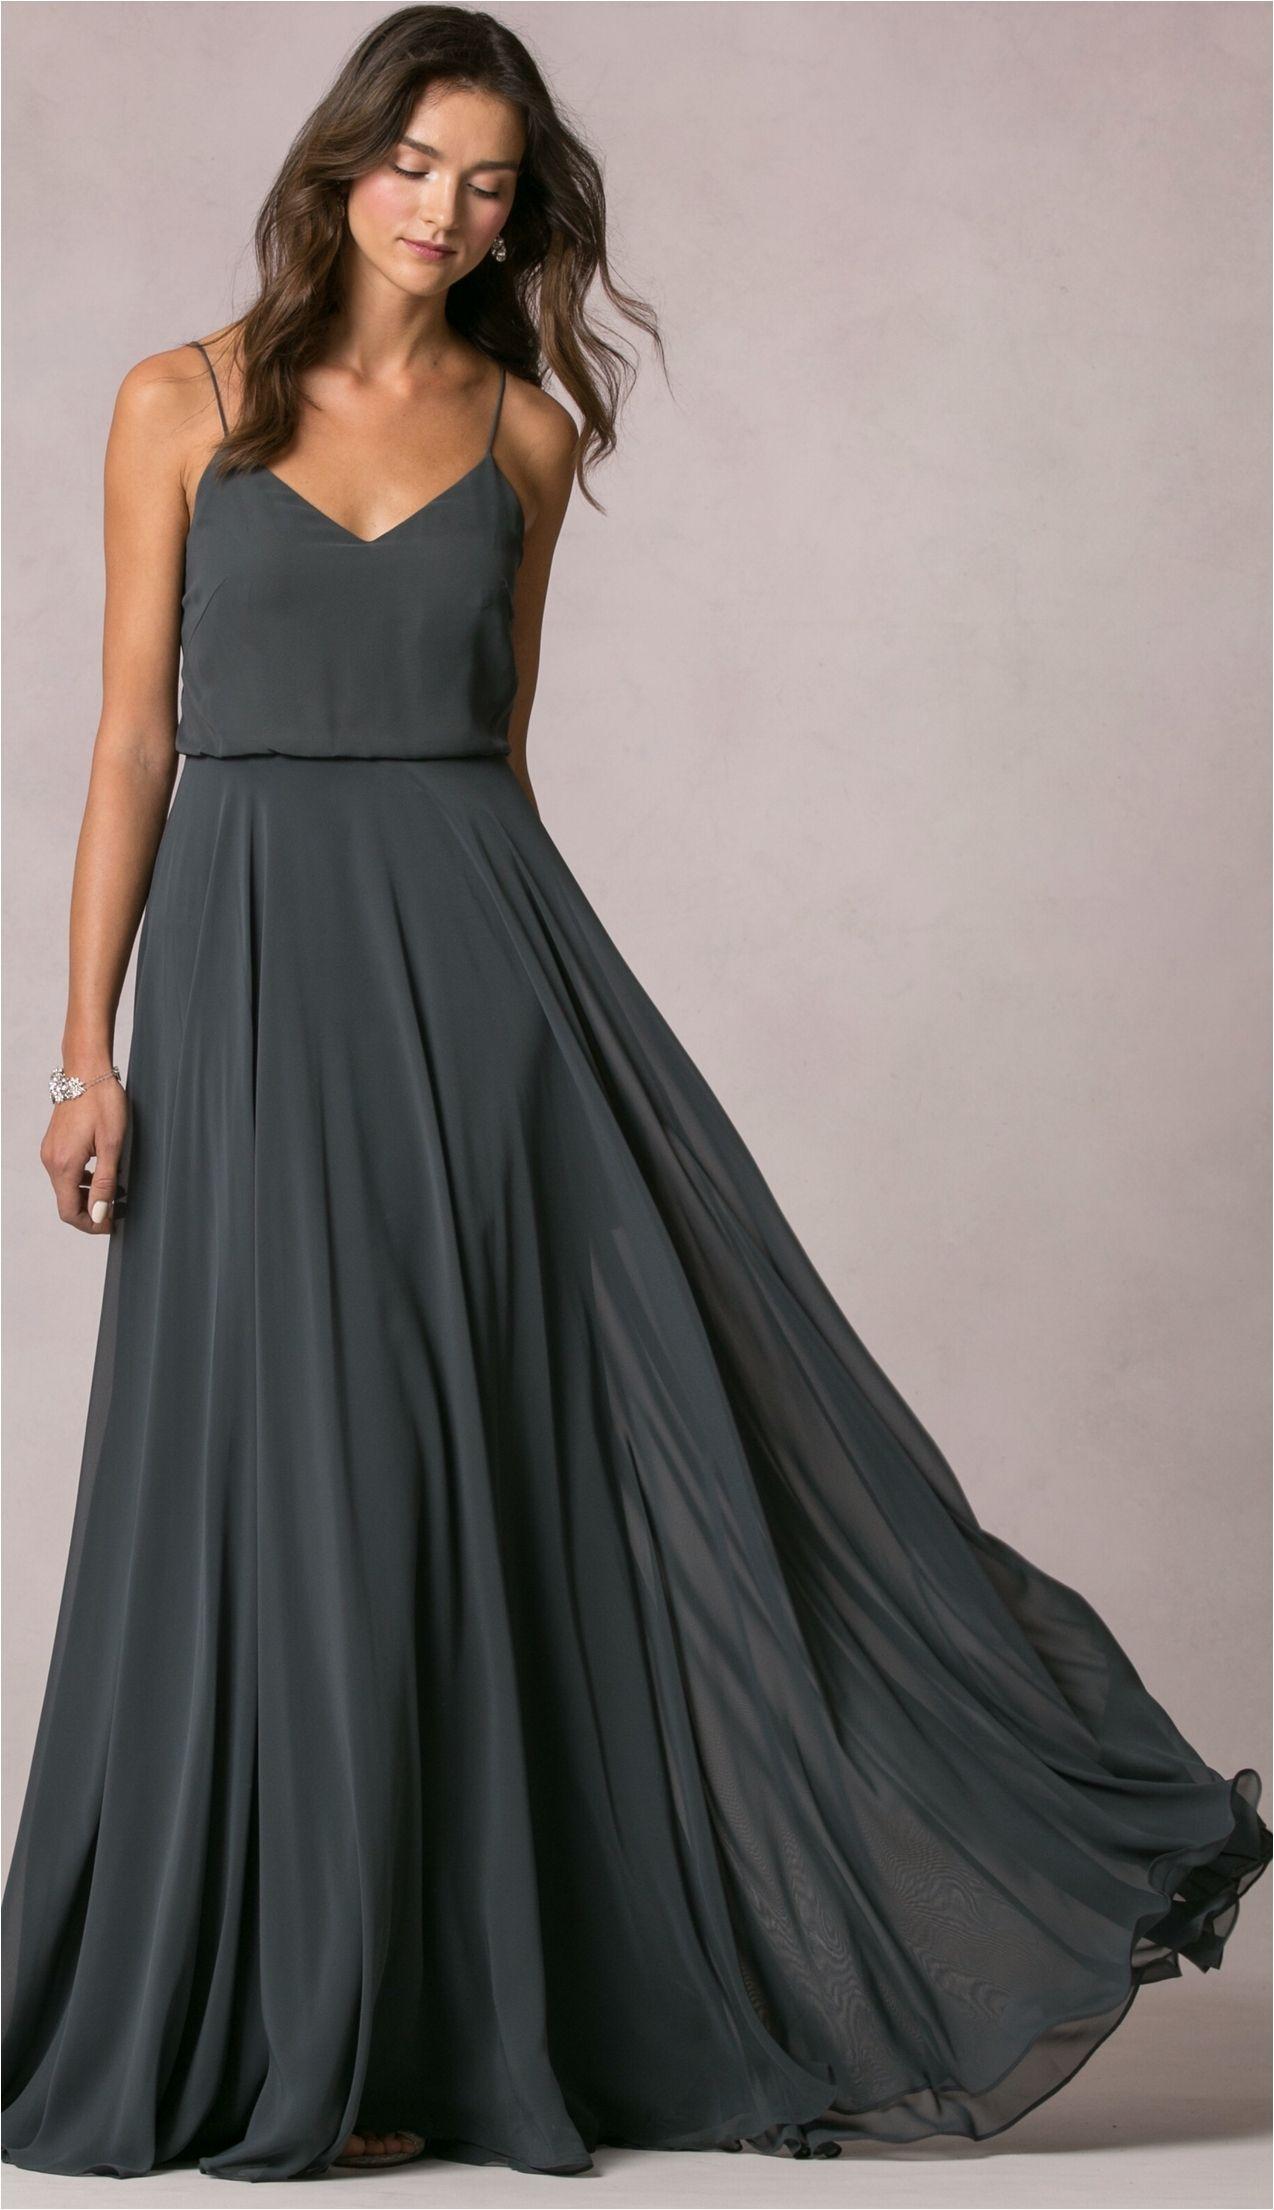 Simple and elegant long bridesmaid dresses ideas for your best simple and elegant long bridesmaid dresses ideas for your best bridesmaid ombrellifo Choice Image